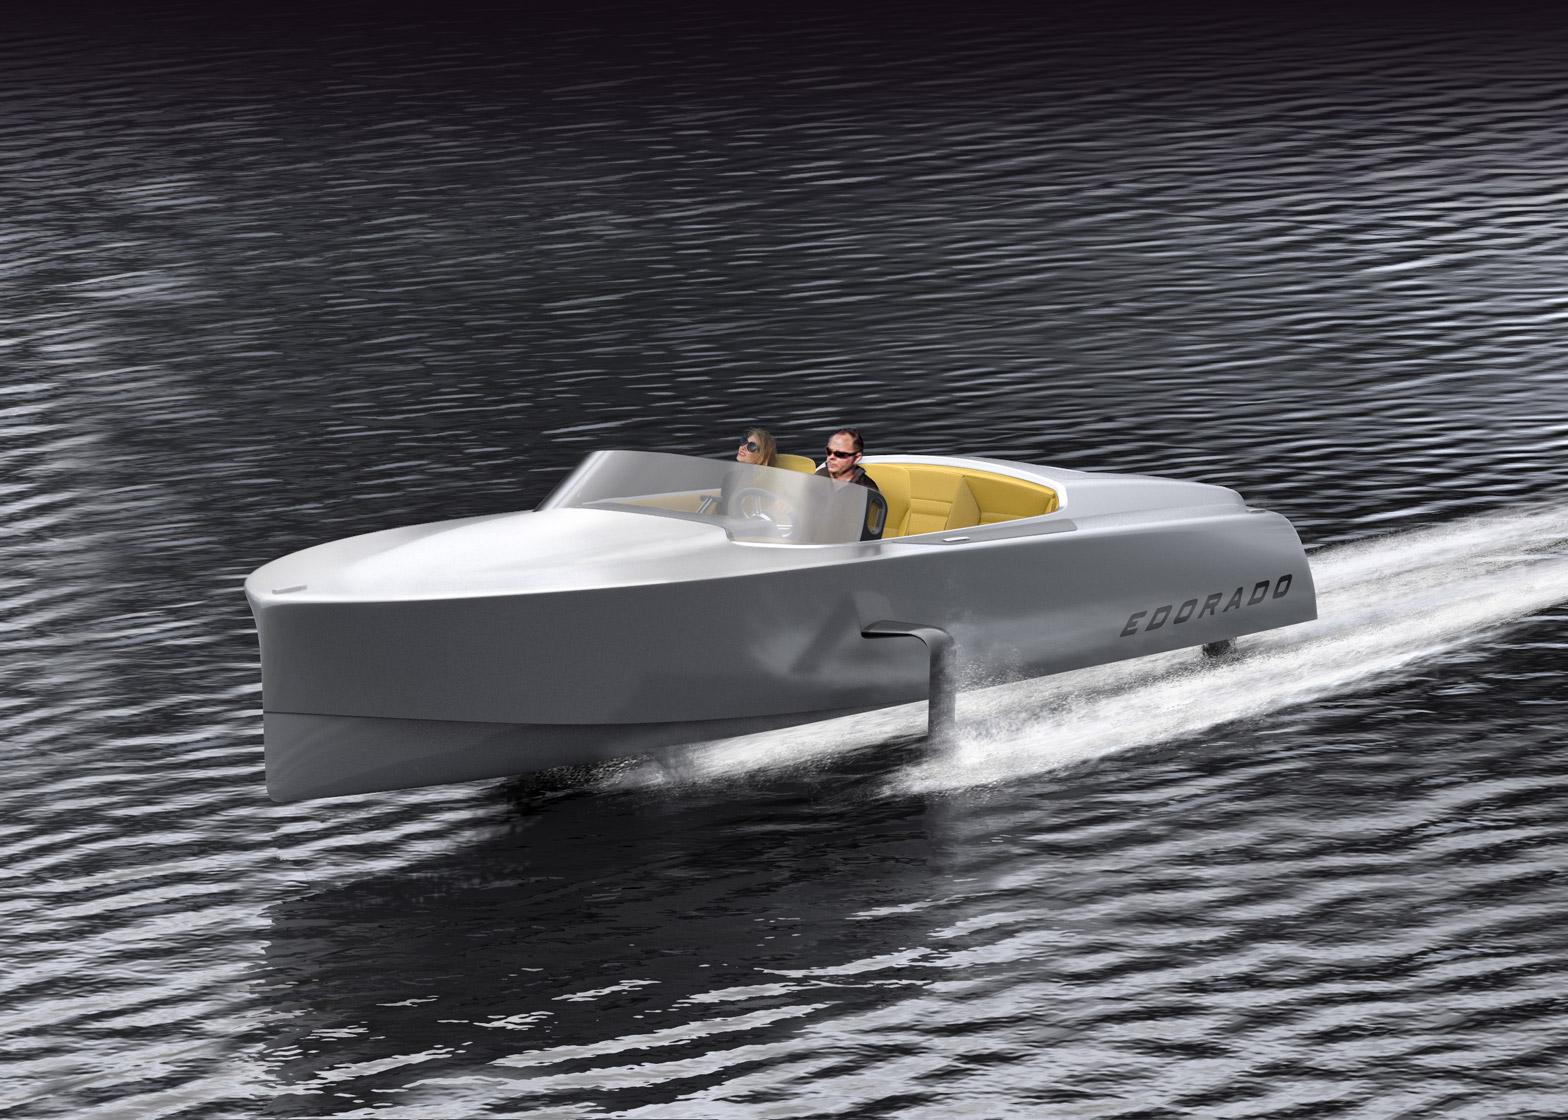 Edorado-S7_electric-powerboat_dezeen_1568_2.jpg